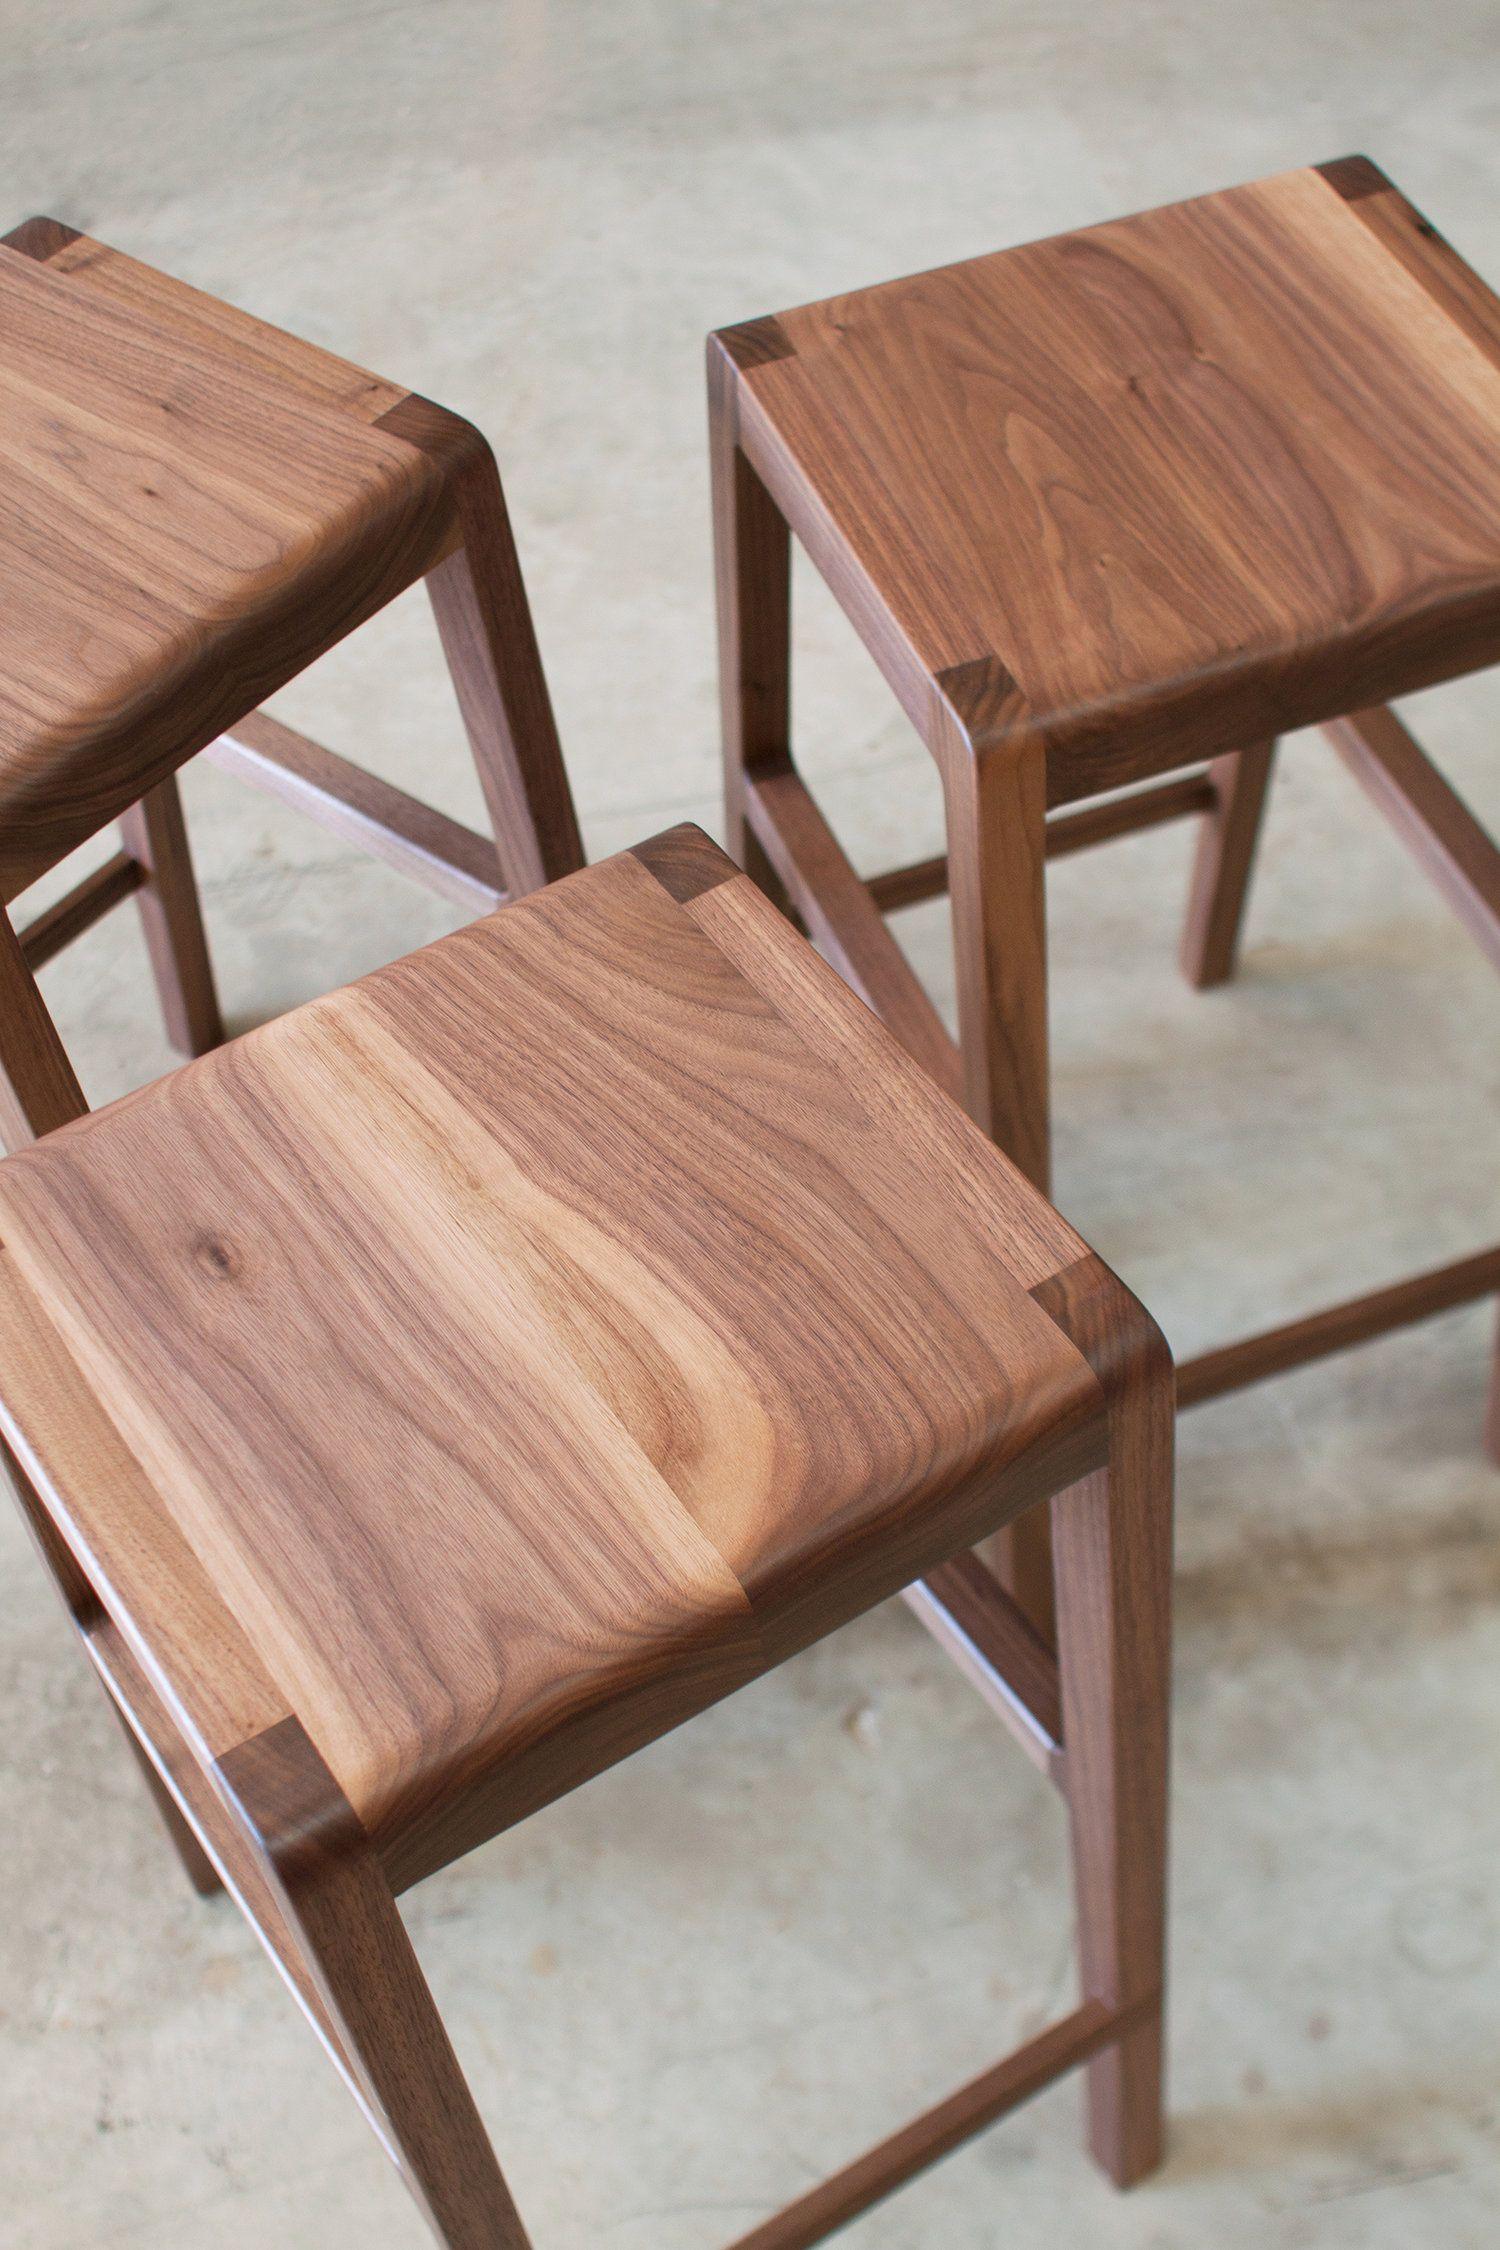 willox barstool 02 | ahşap sandalye tabure bank chair stool